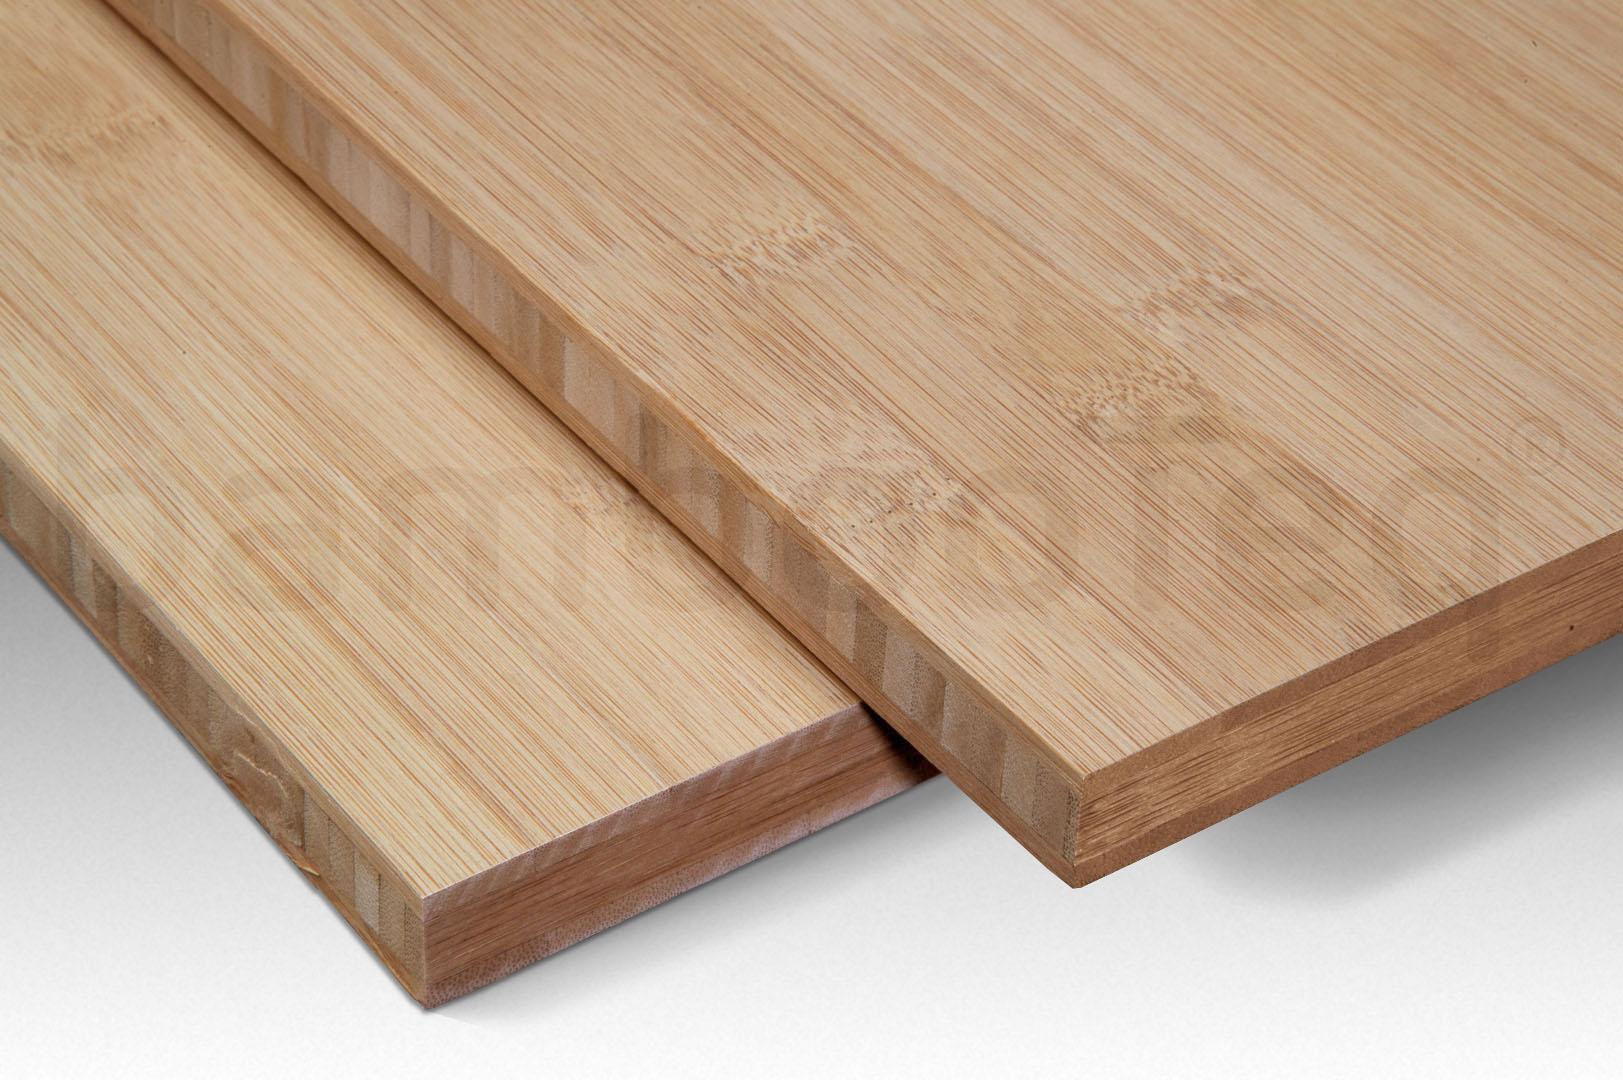 Moso Bamboe Prijzen : Bamboe plaat mm plain pressed laags caramel cm